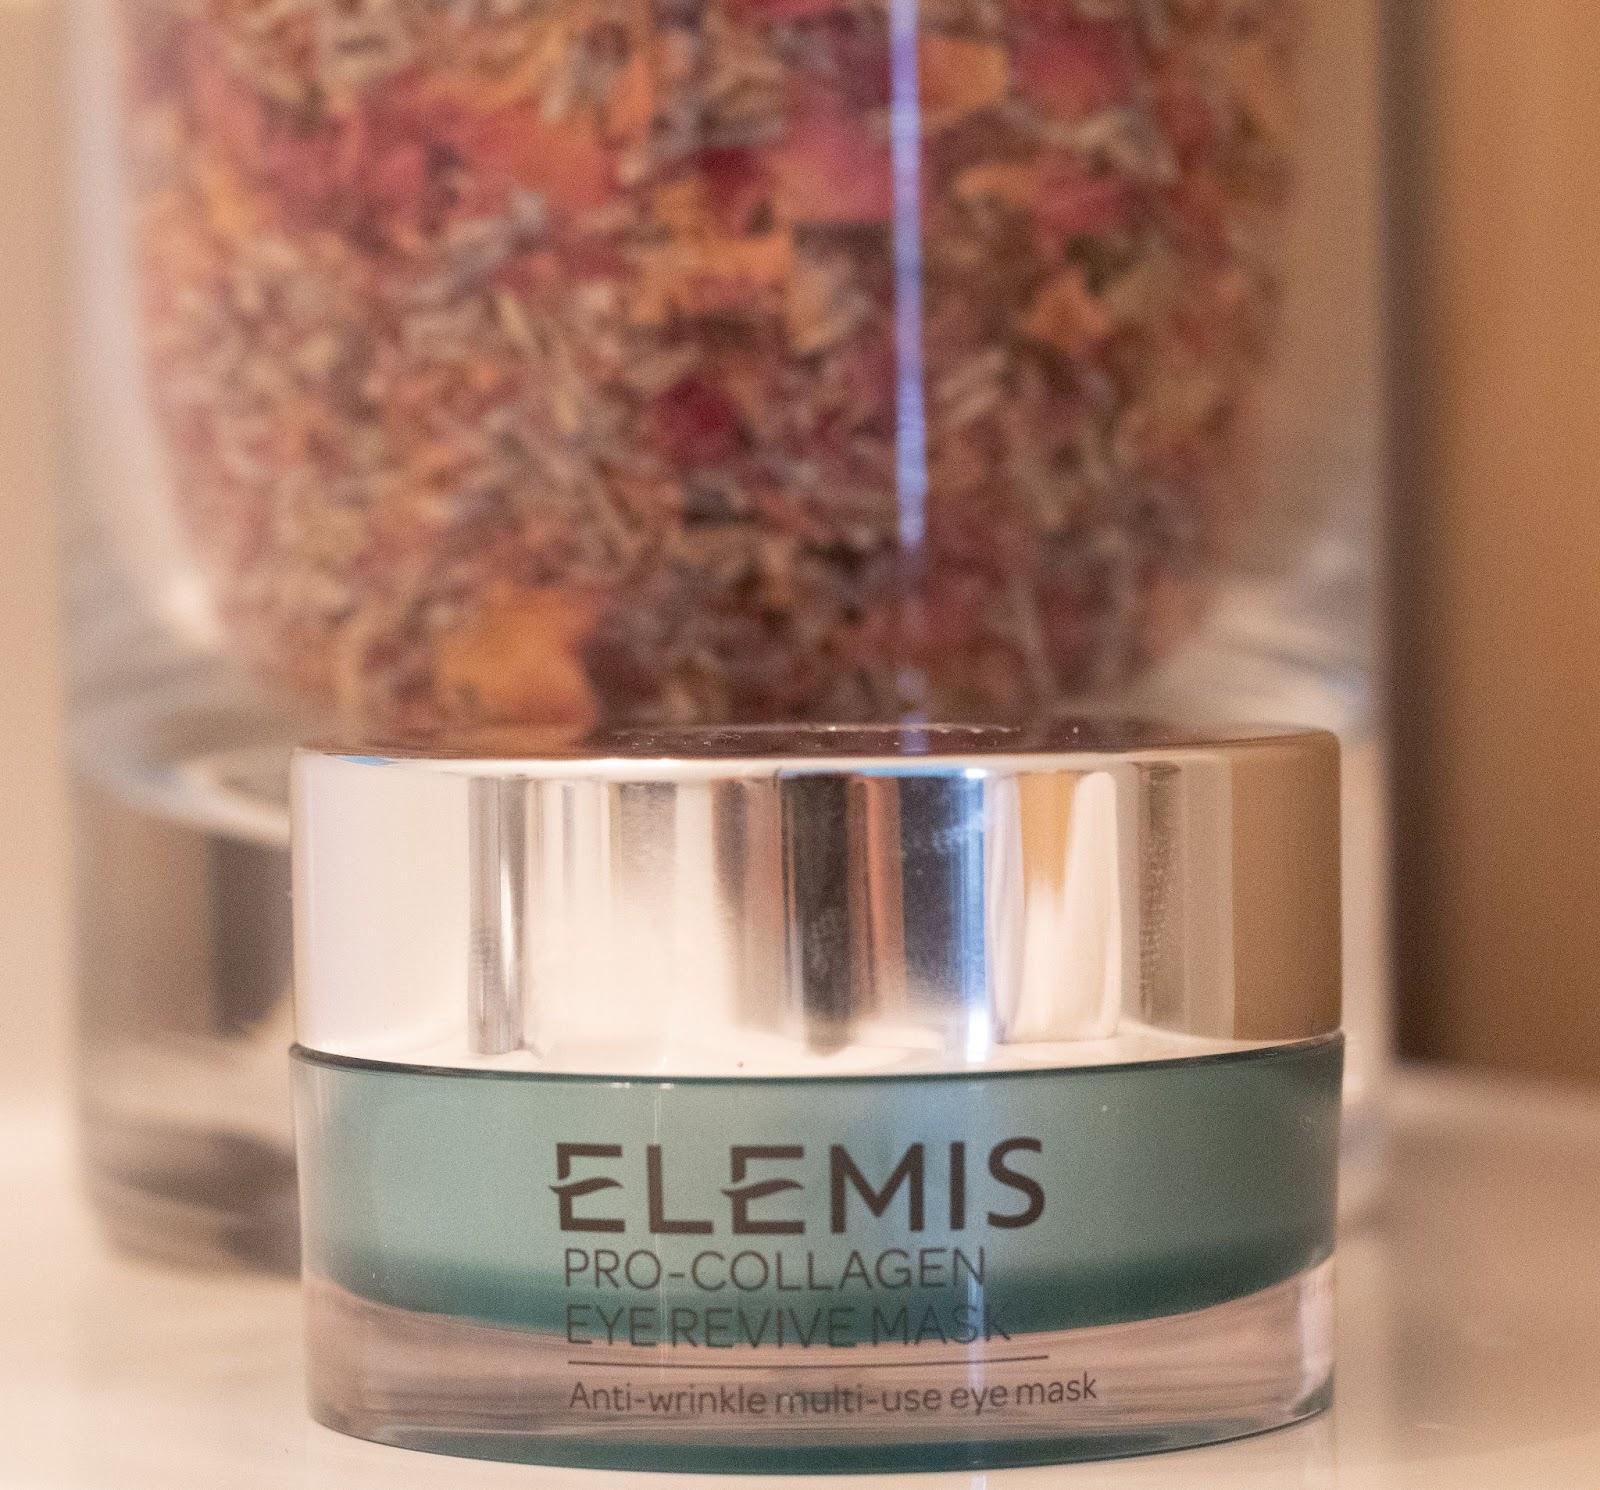 ELEMIS Pro-Collagen Eye Revive Mask - Patience & Pearls